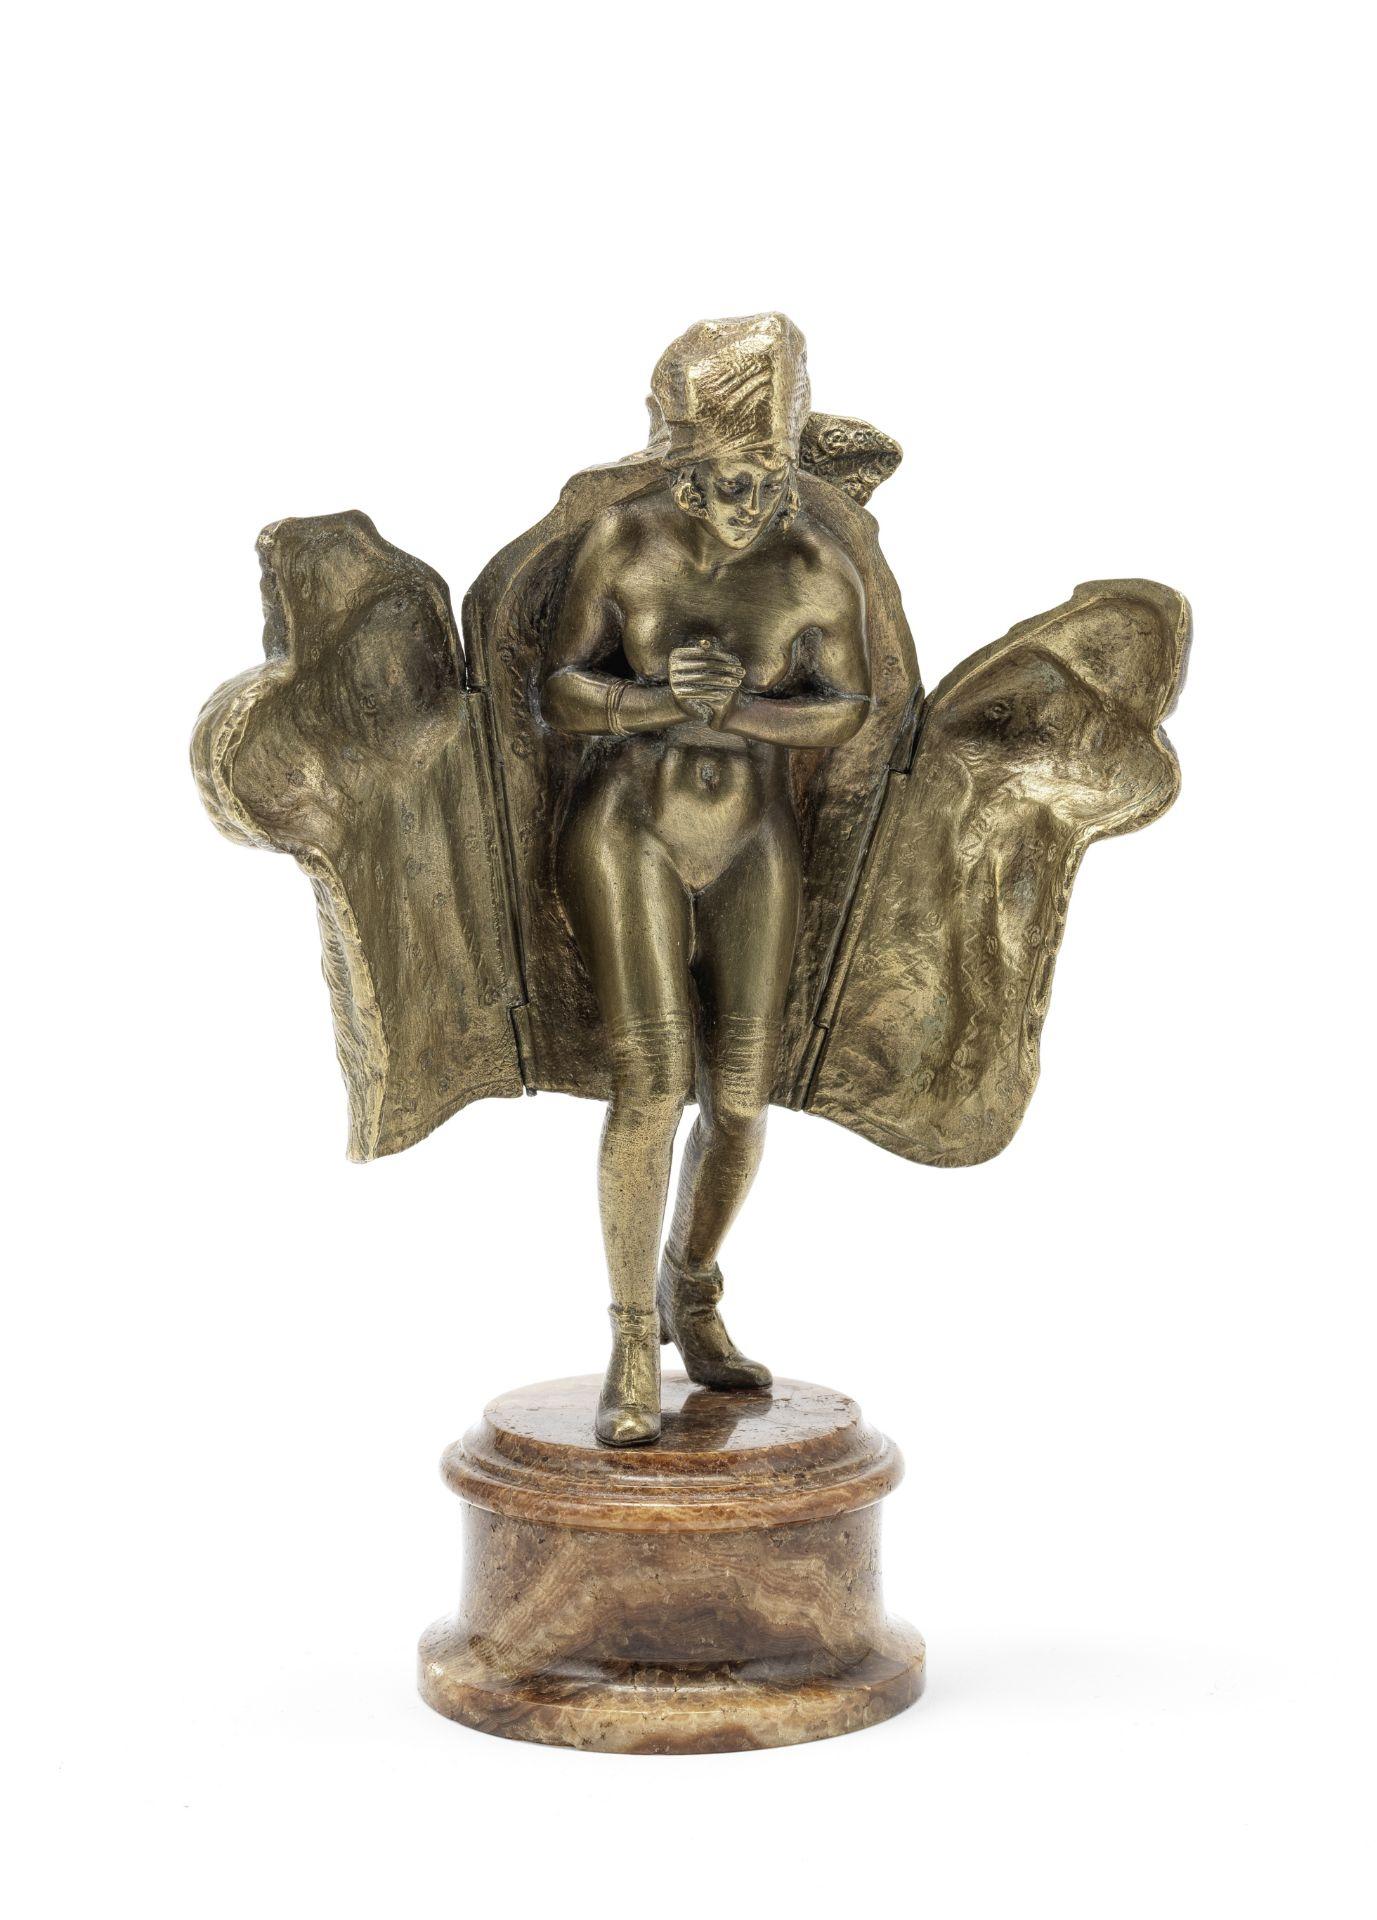 After Bruno Zach (Austrian, 1891-1935): A gilt bronze metamorphic erotic figure of a 'fur coat la... - Image 2 of 2